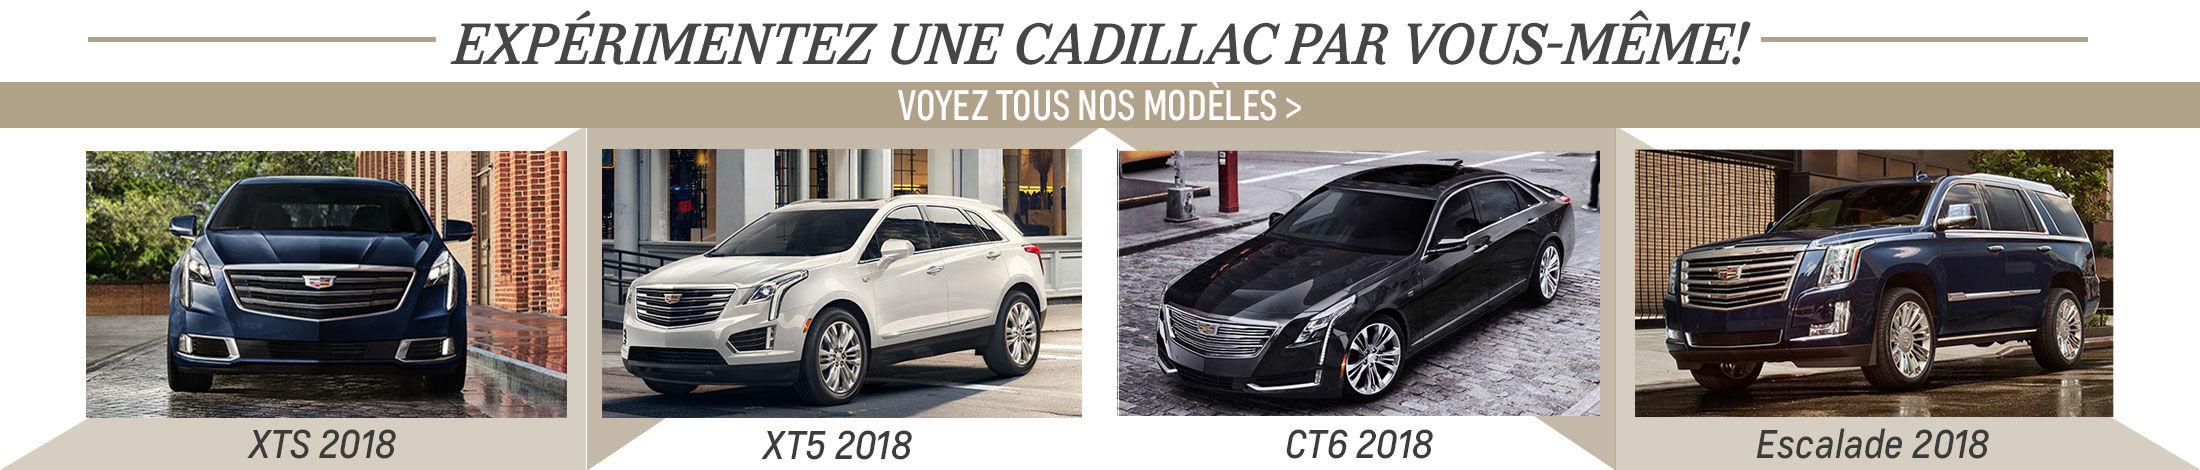 Cadillac 2018